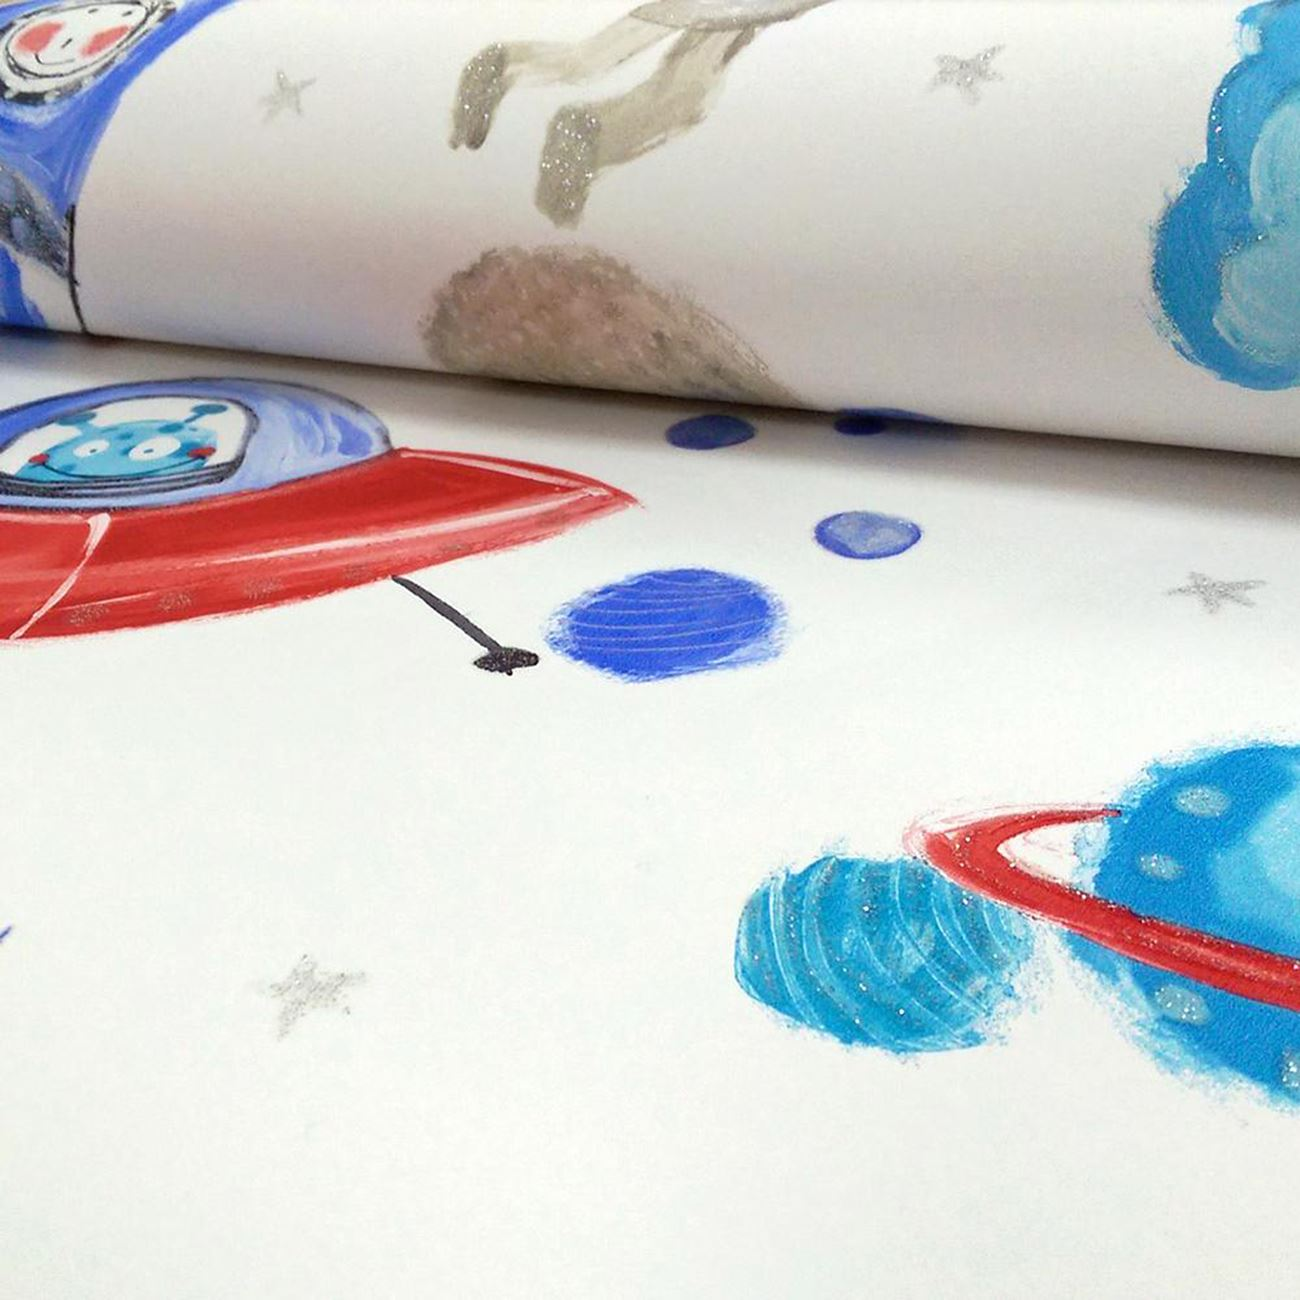 ARTHOUSE-GLITTER-DETAIL-KIDS-WALLPAPER-BEDROOM-UNICORN-MERMAID-SPACE thumbnail 76